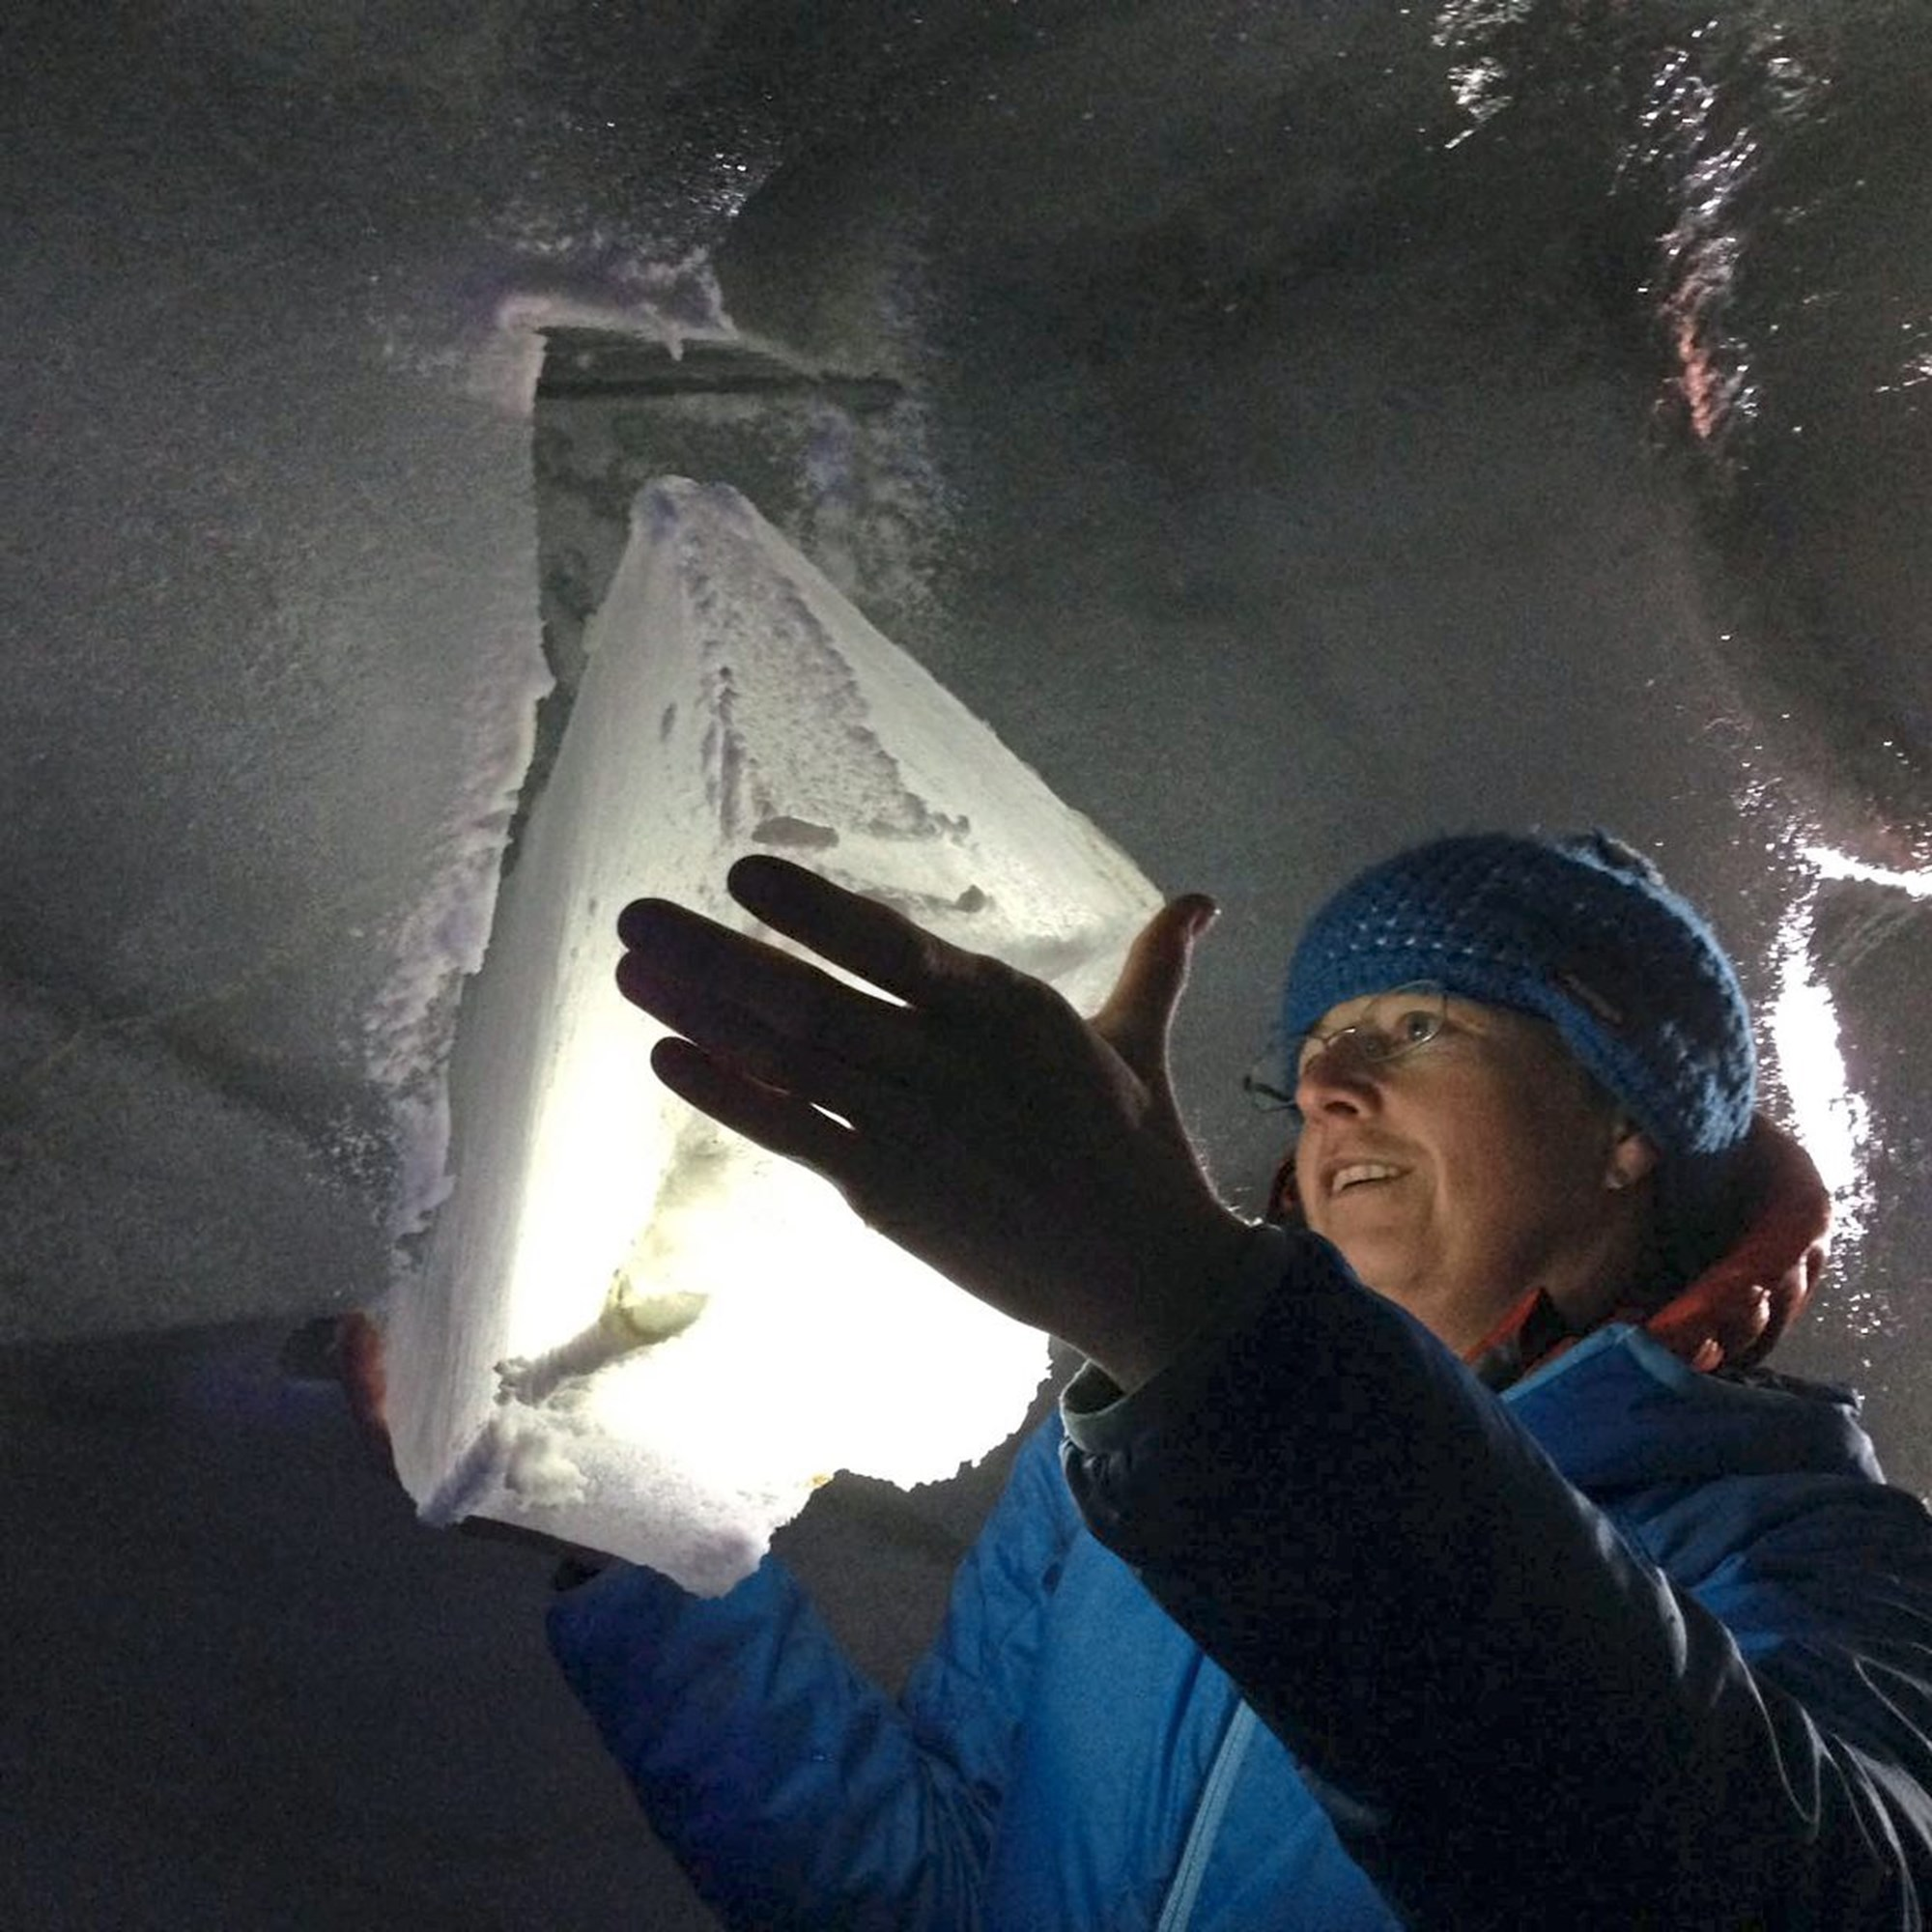 Forscher datieren Gletschereis präzise mit Quantenphysik – derStandard.at